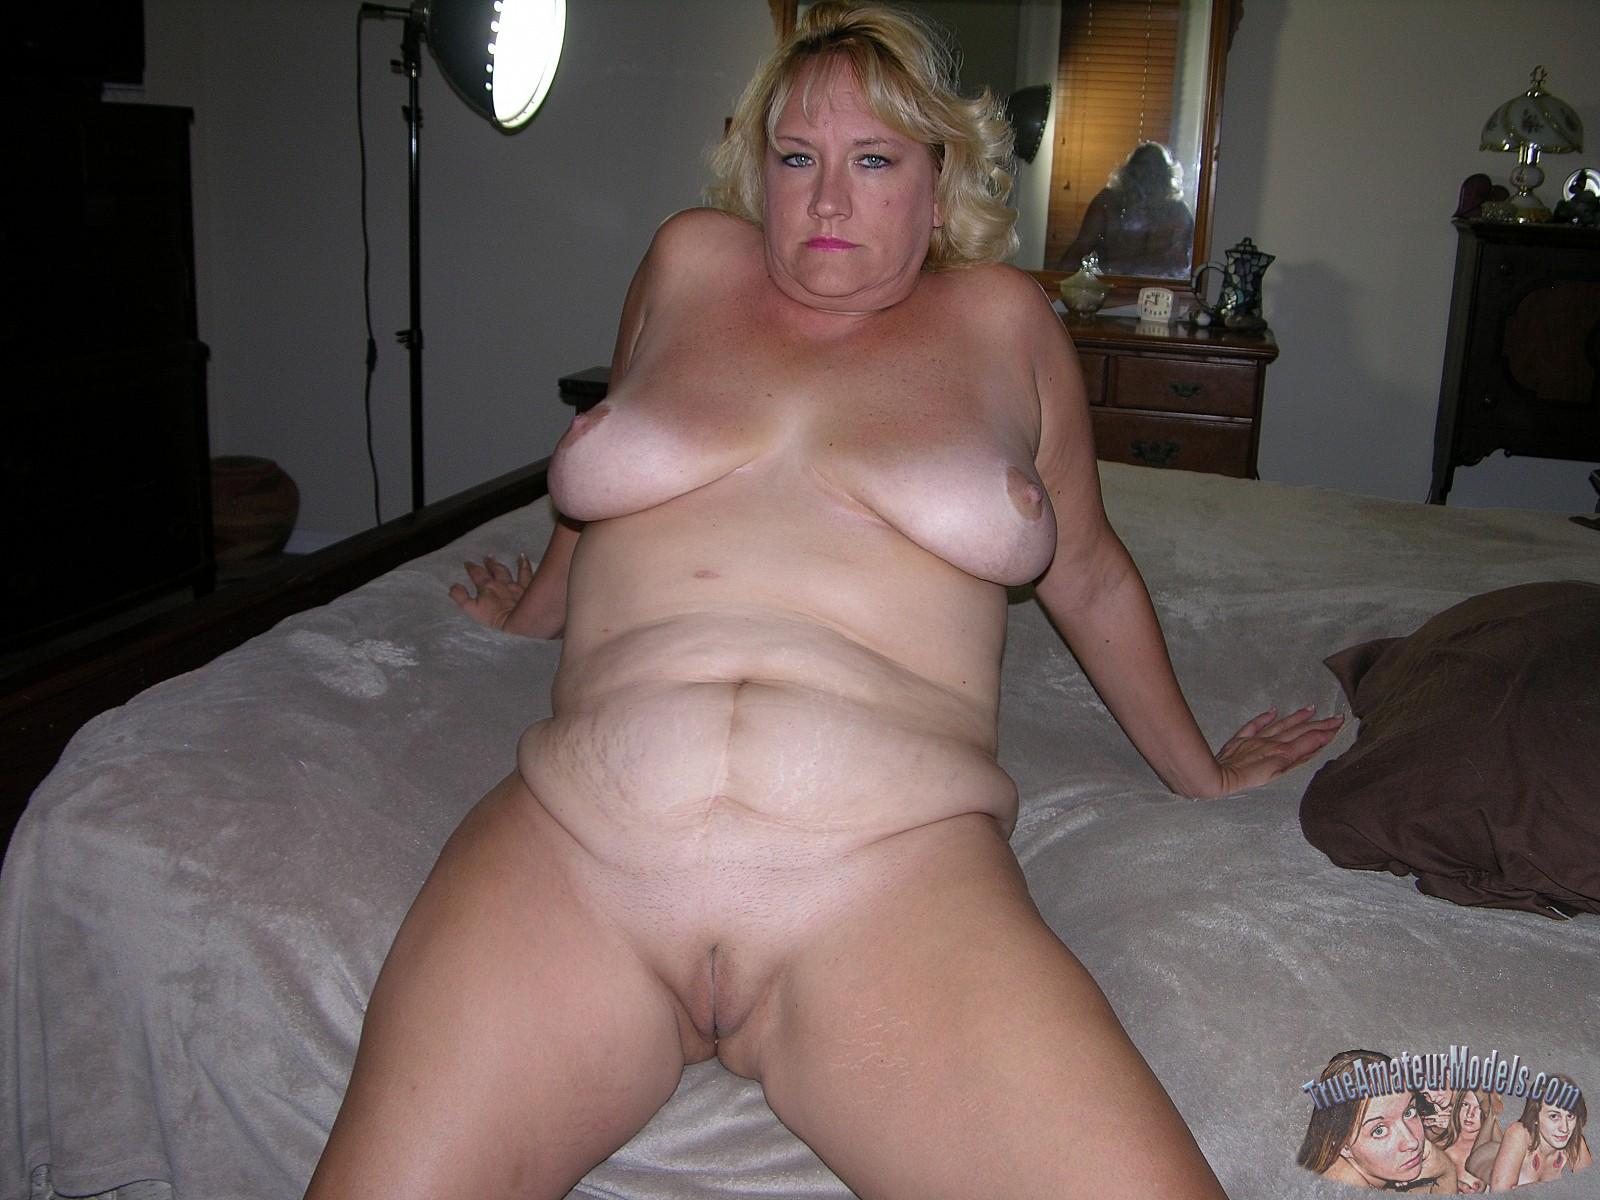 amateur mature nude women bedroom